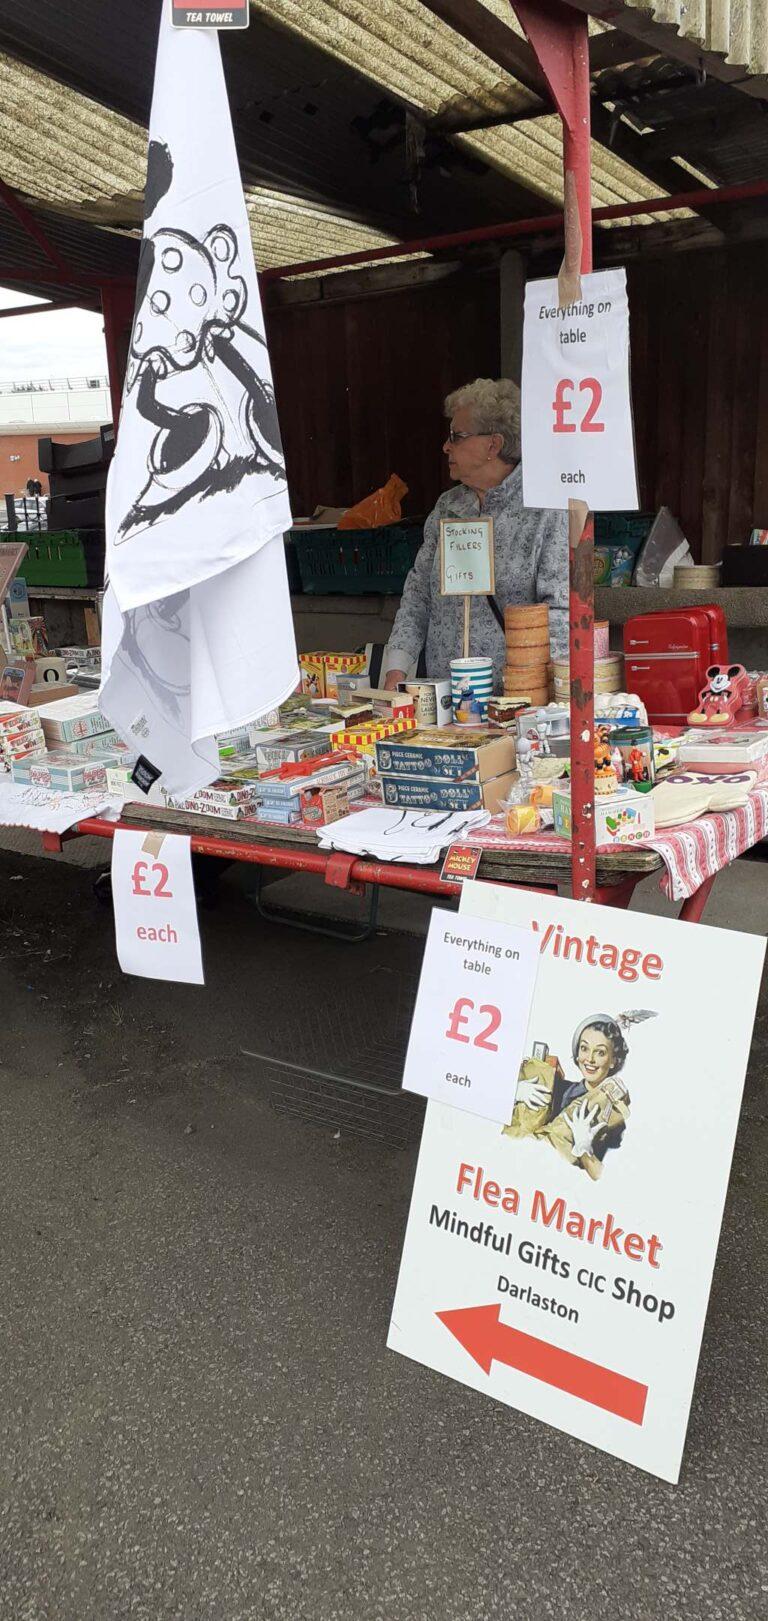 Mindful Gifts Cic is on Wednesbury Market today